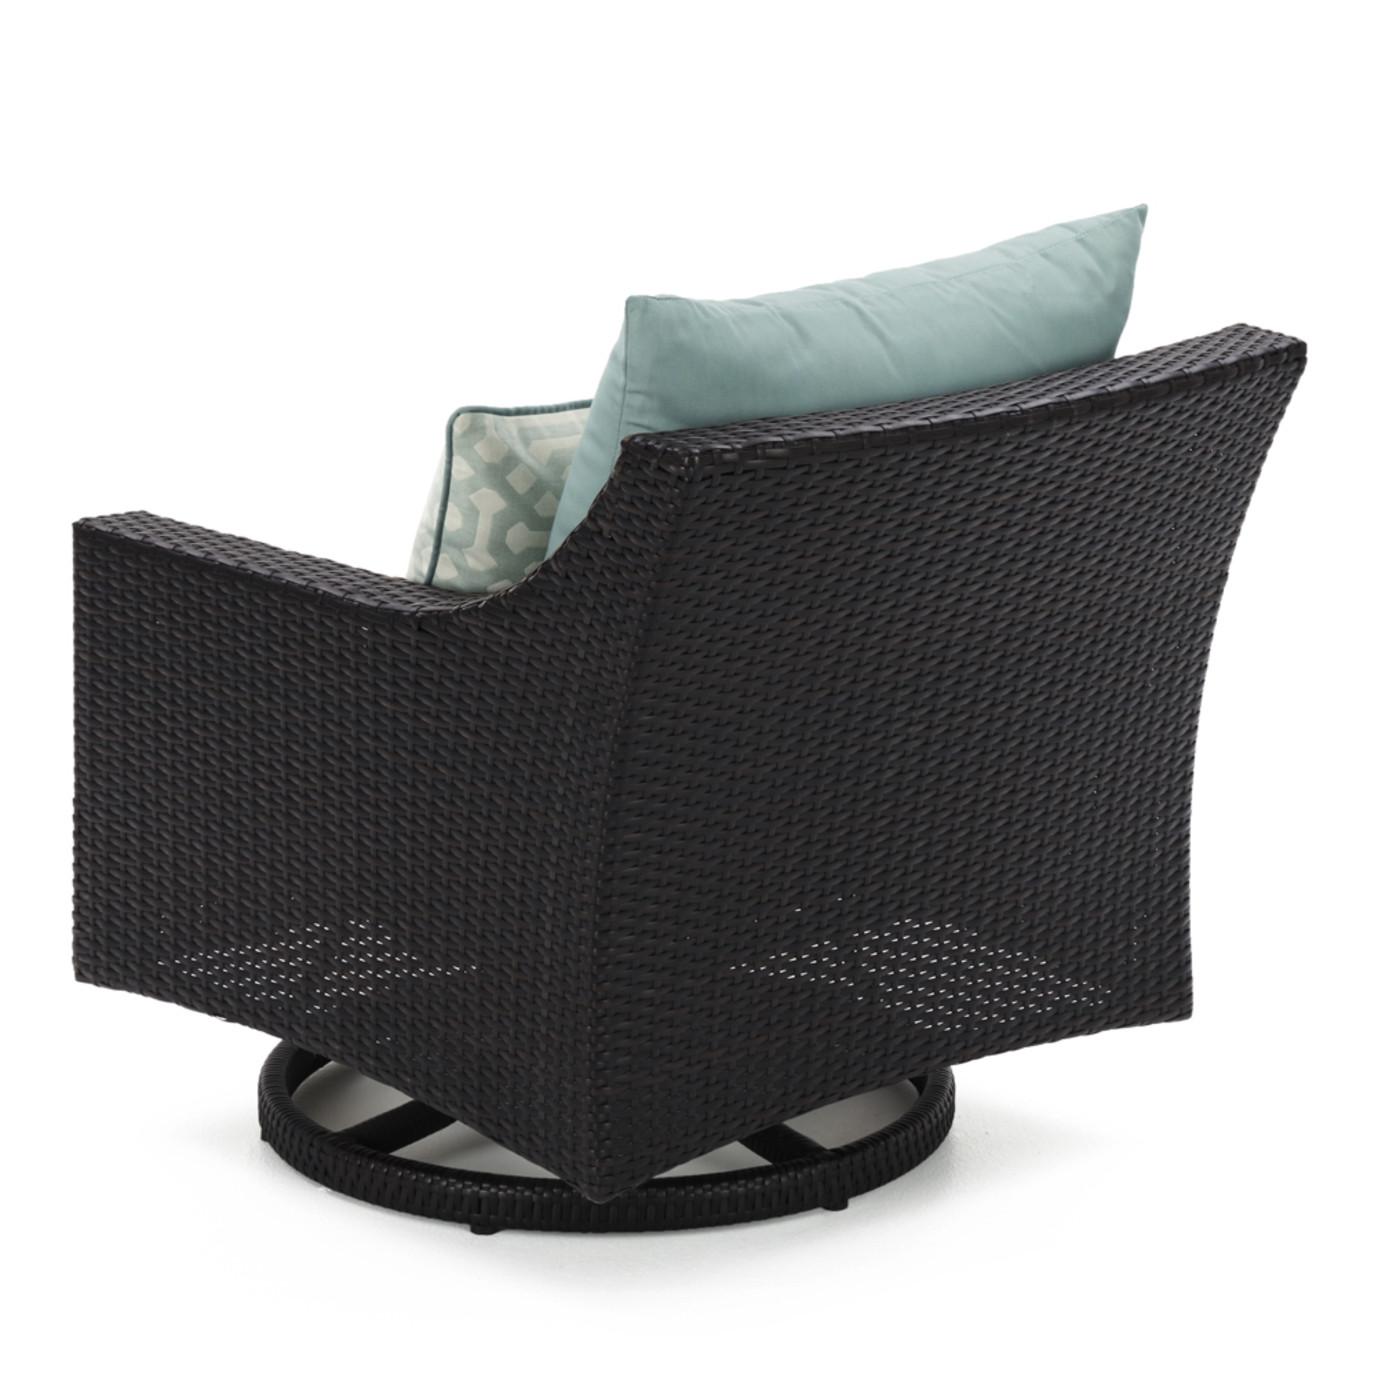 Deco™ Motion Club Chairs - Spa Blue